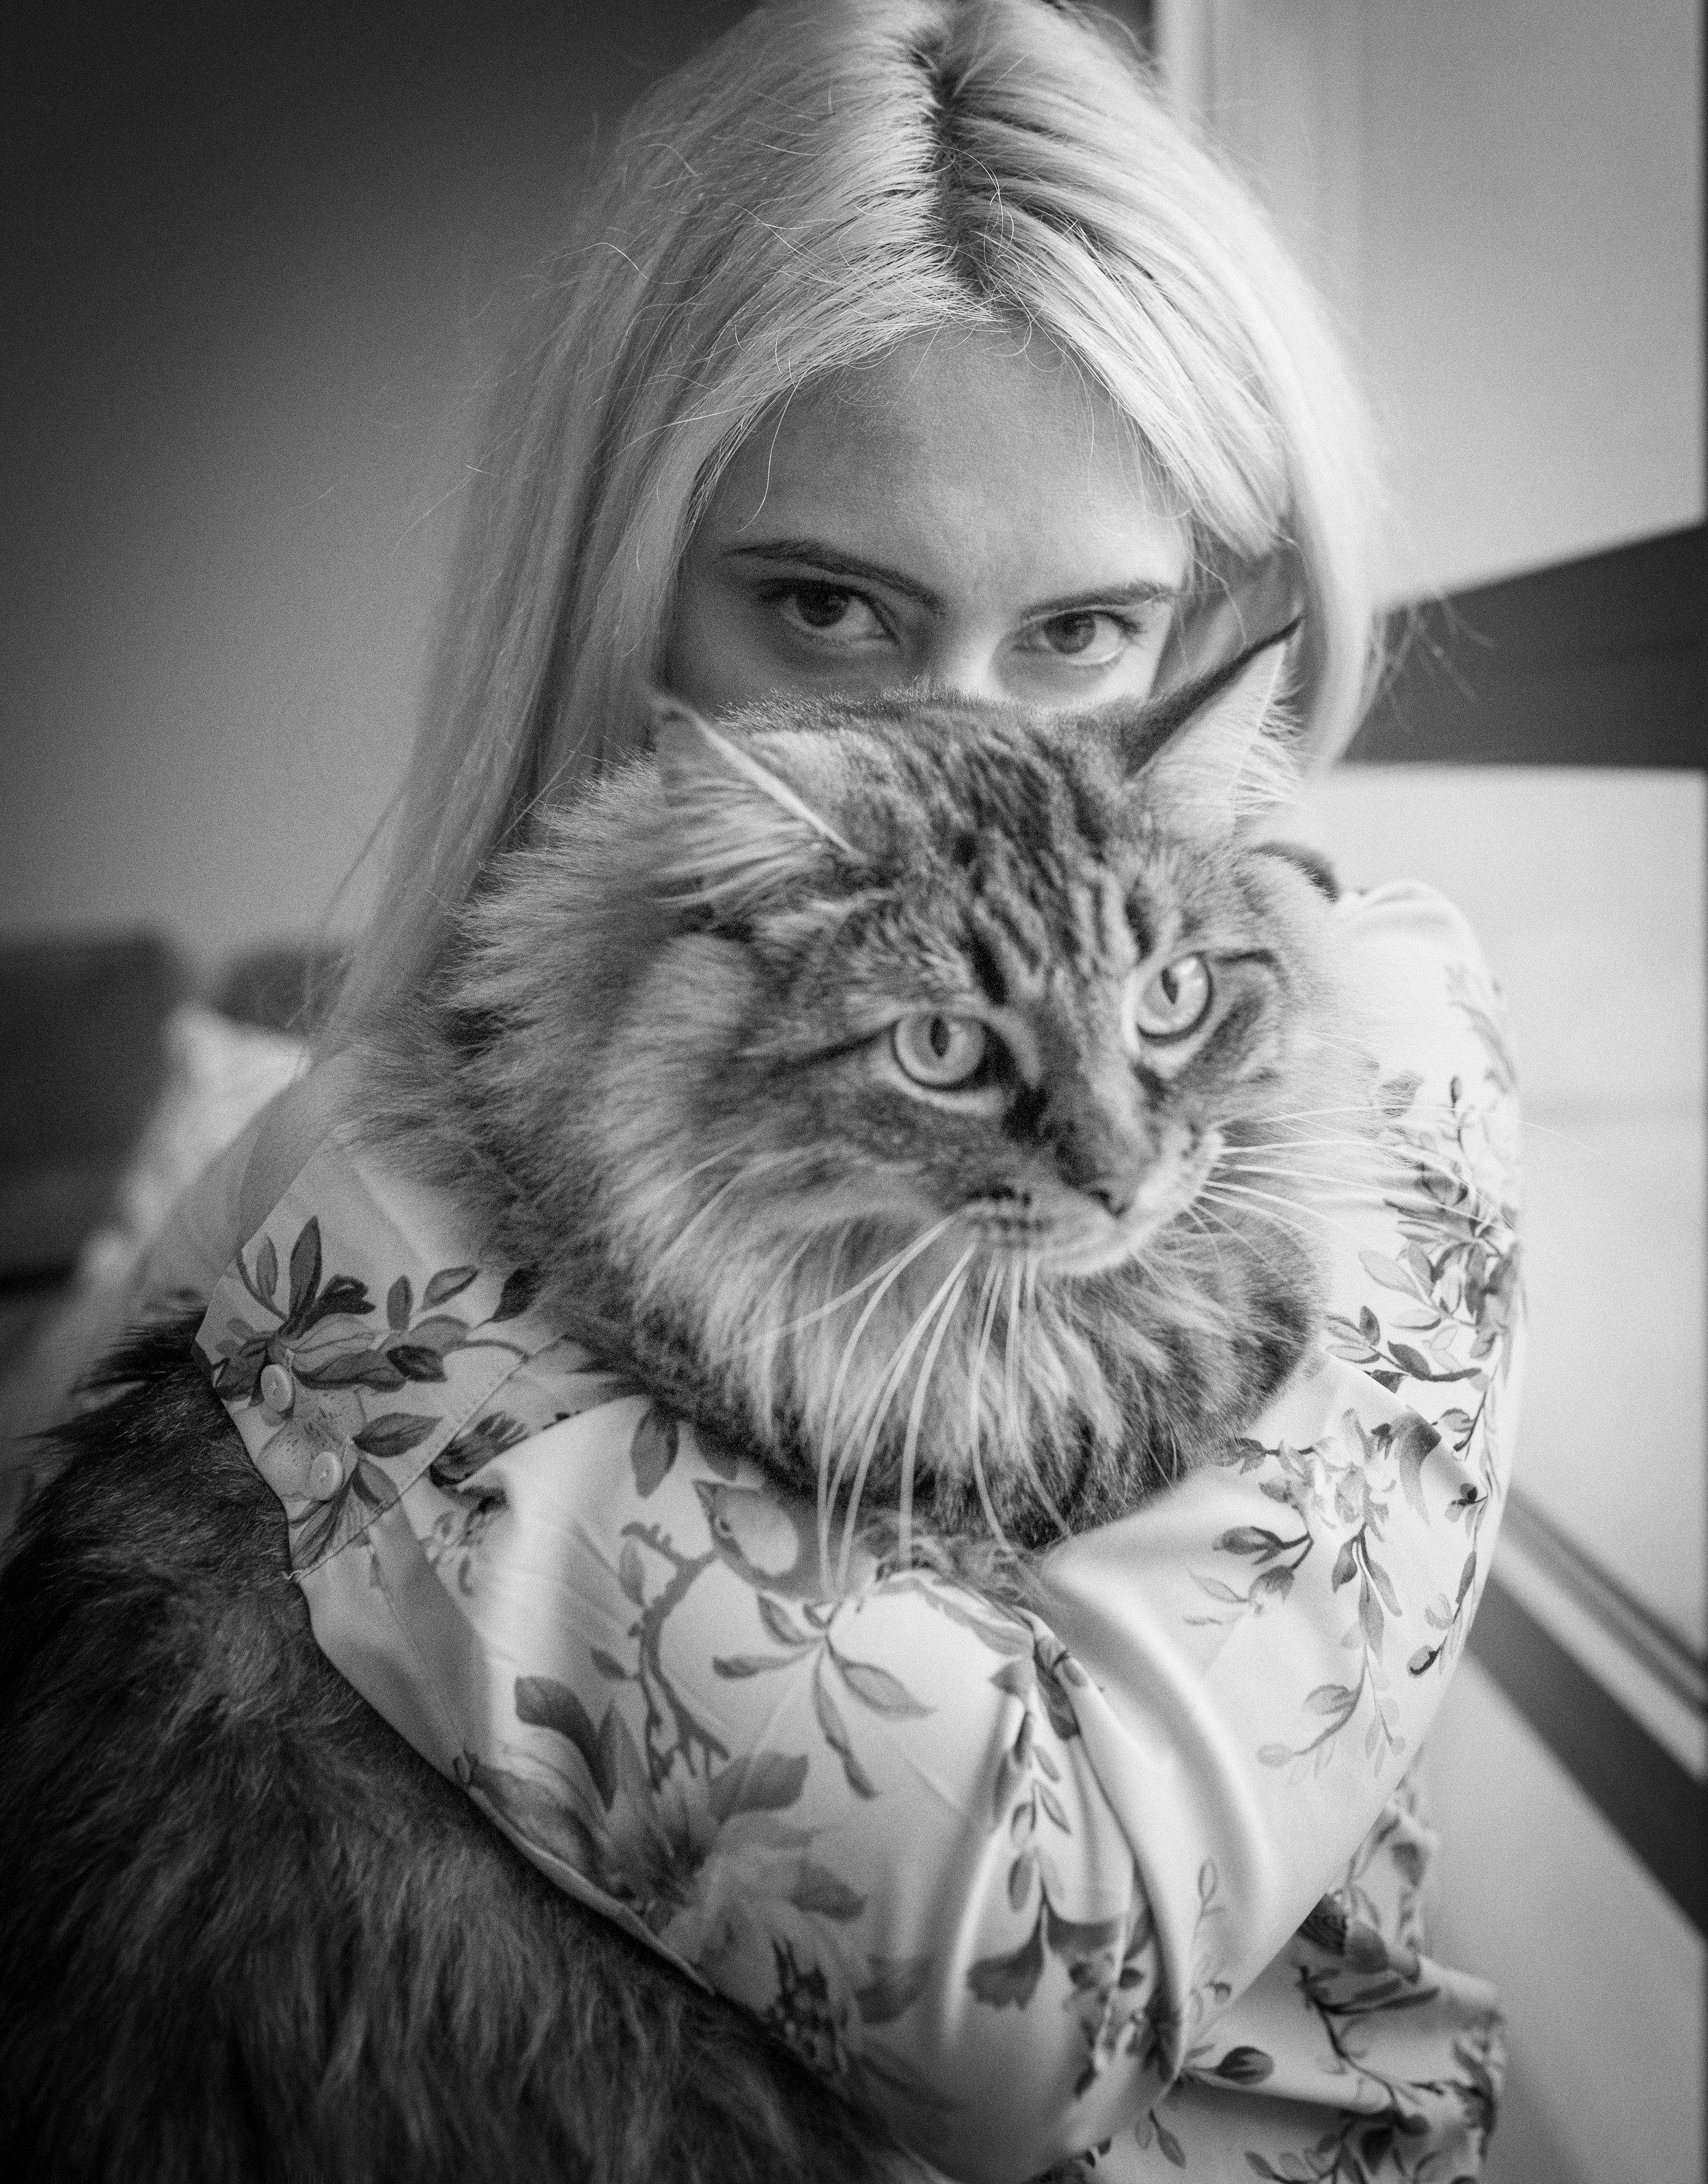 James-cat.jpg